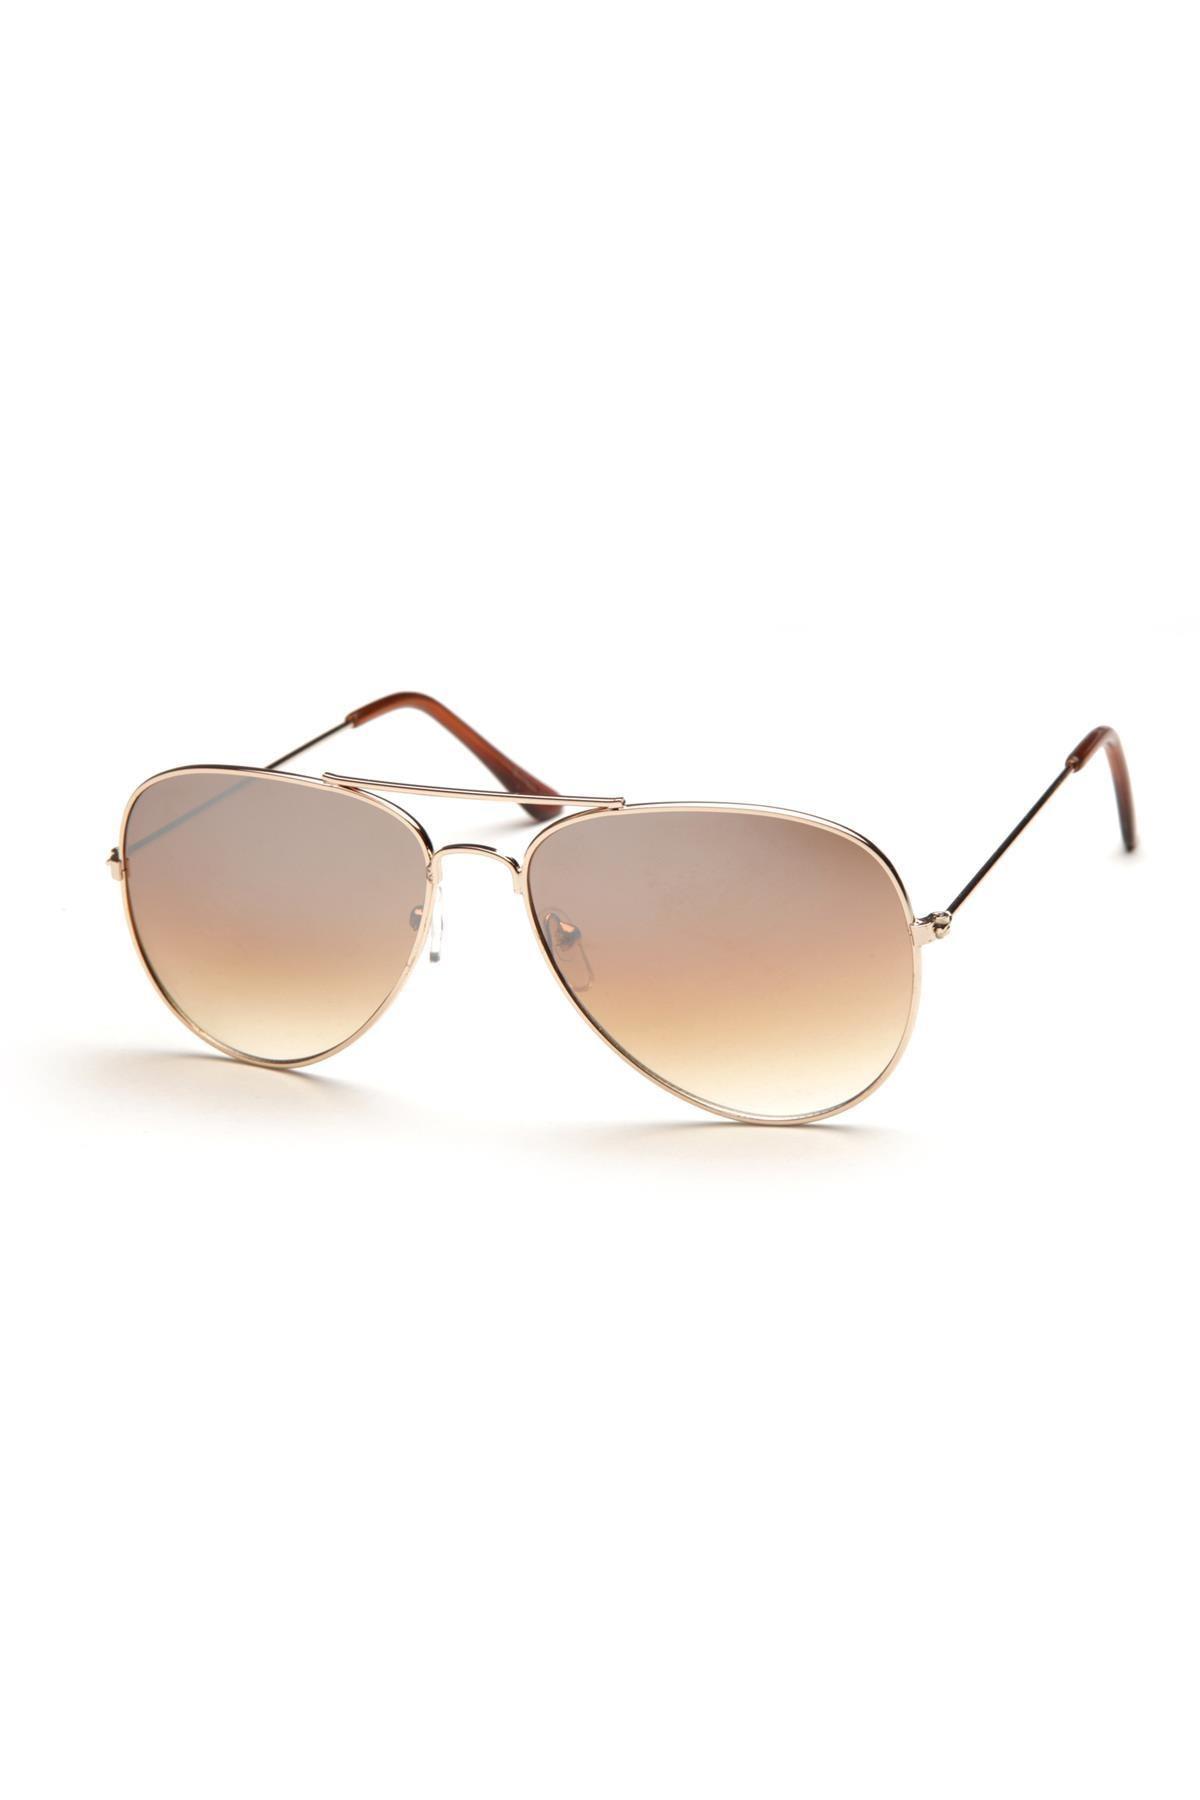 Di Caprio Unisex Oval Güneş Gözlüğü DH1548O